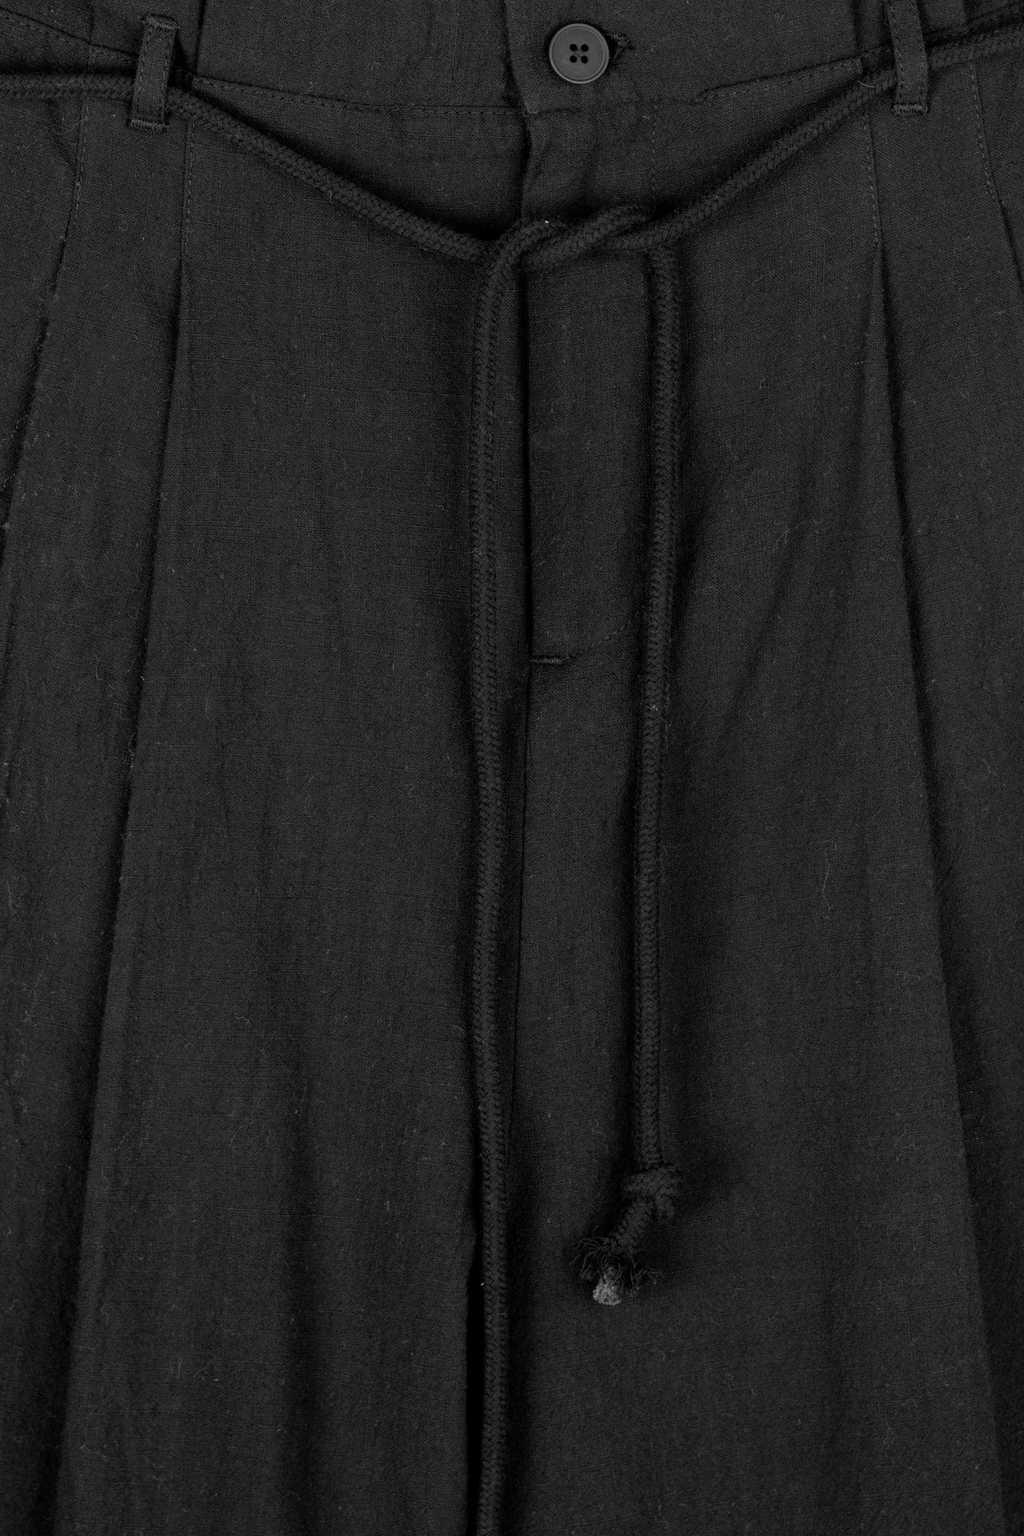 Pant 3669 Black 8